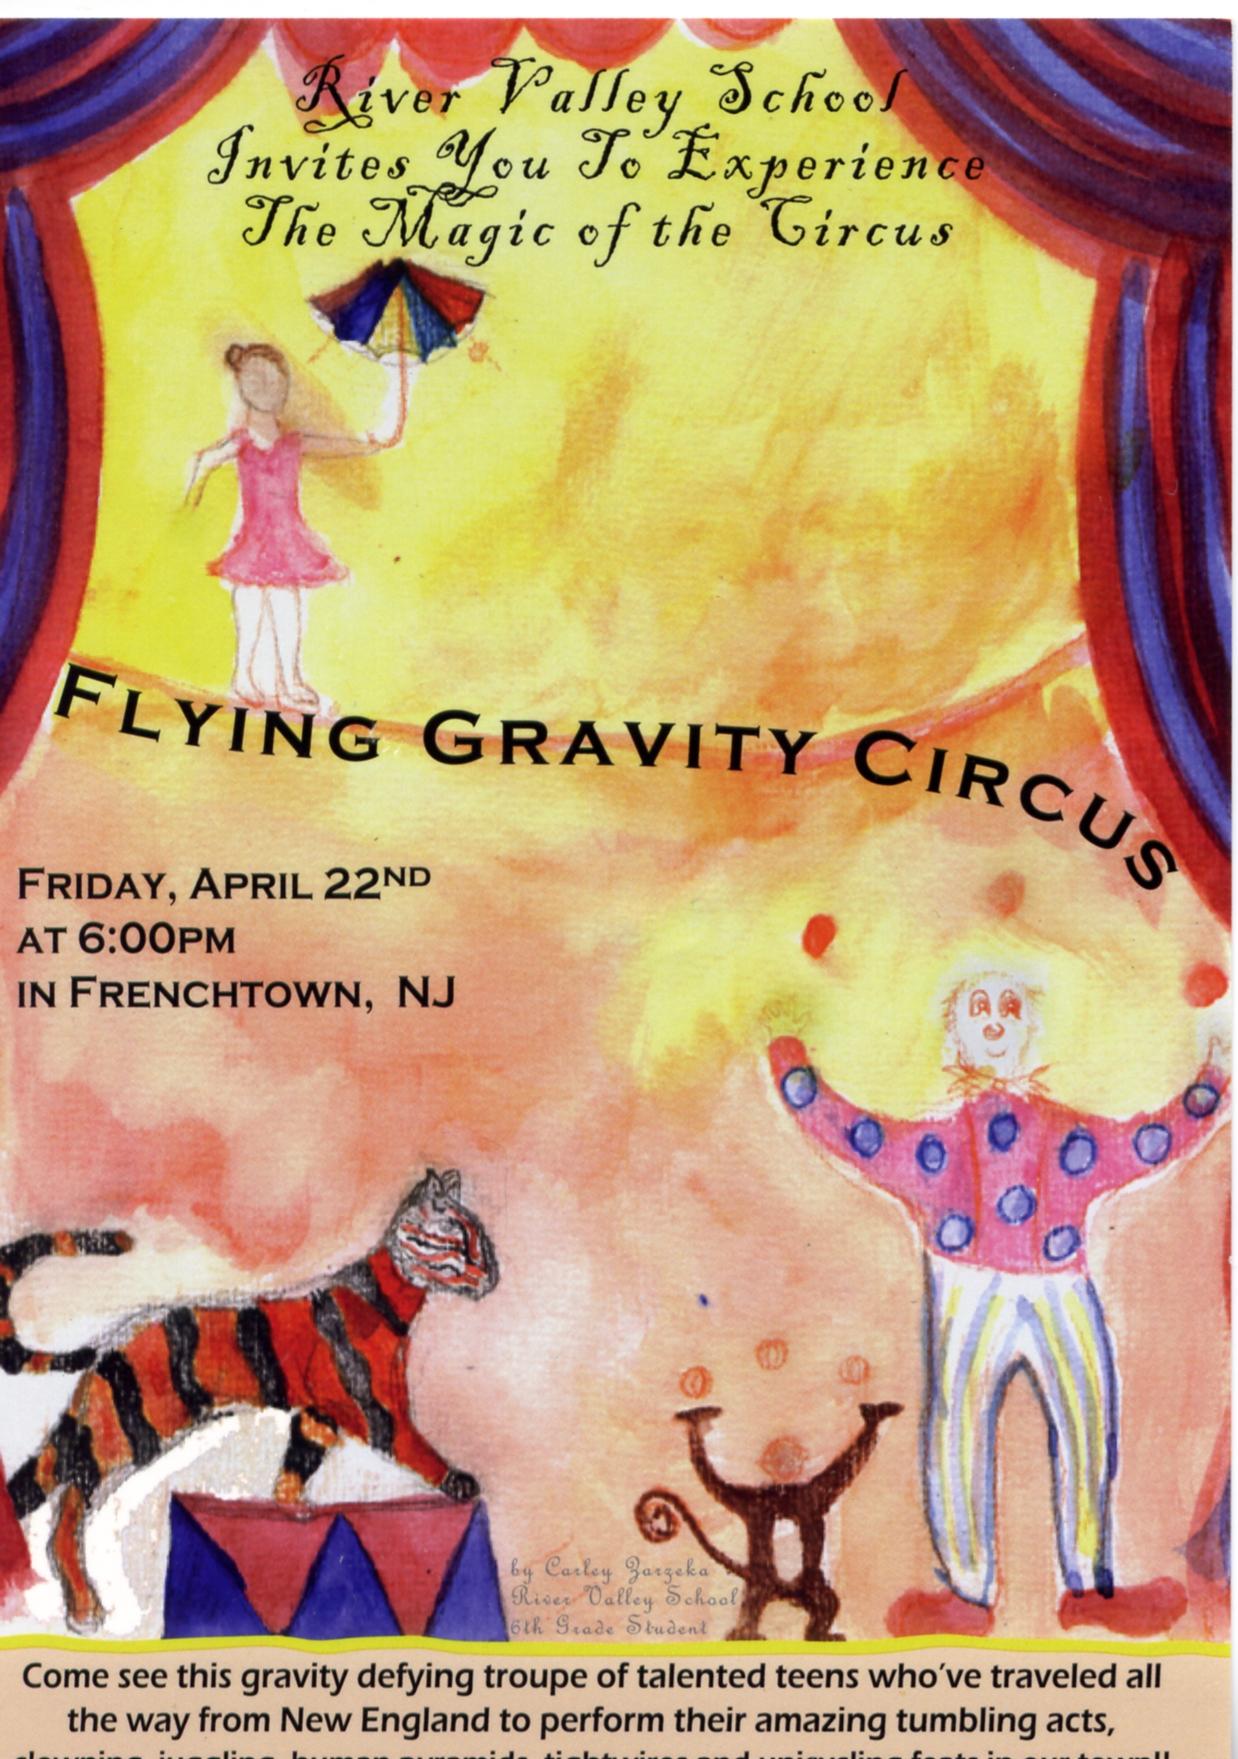 FGC Poster April 22, 2005?